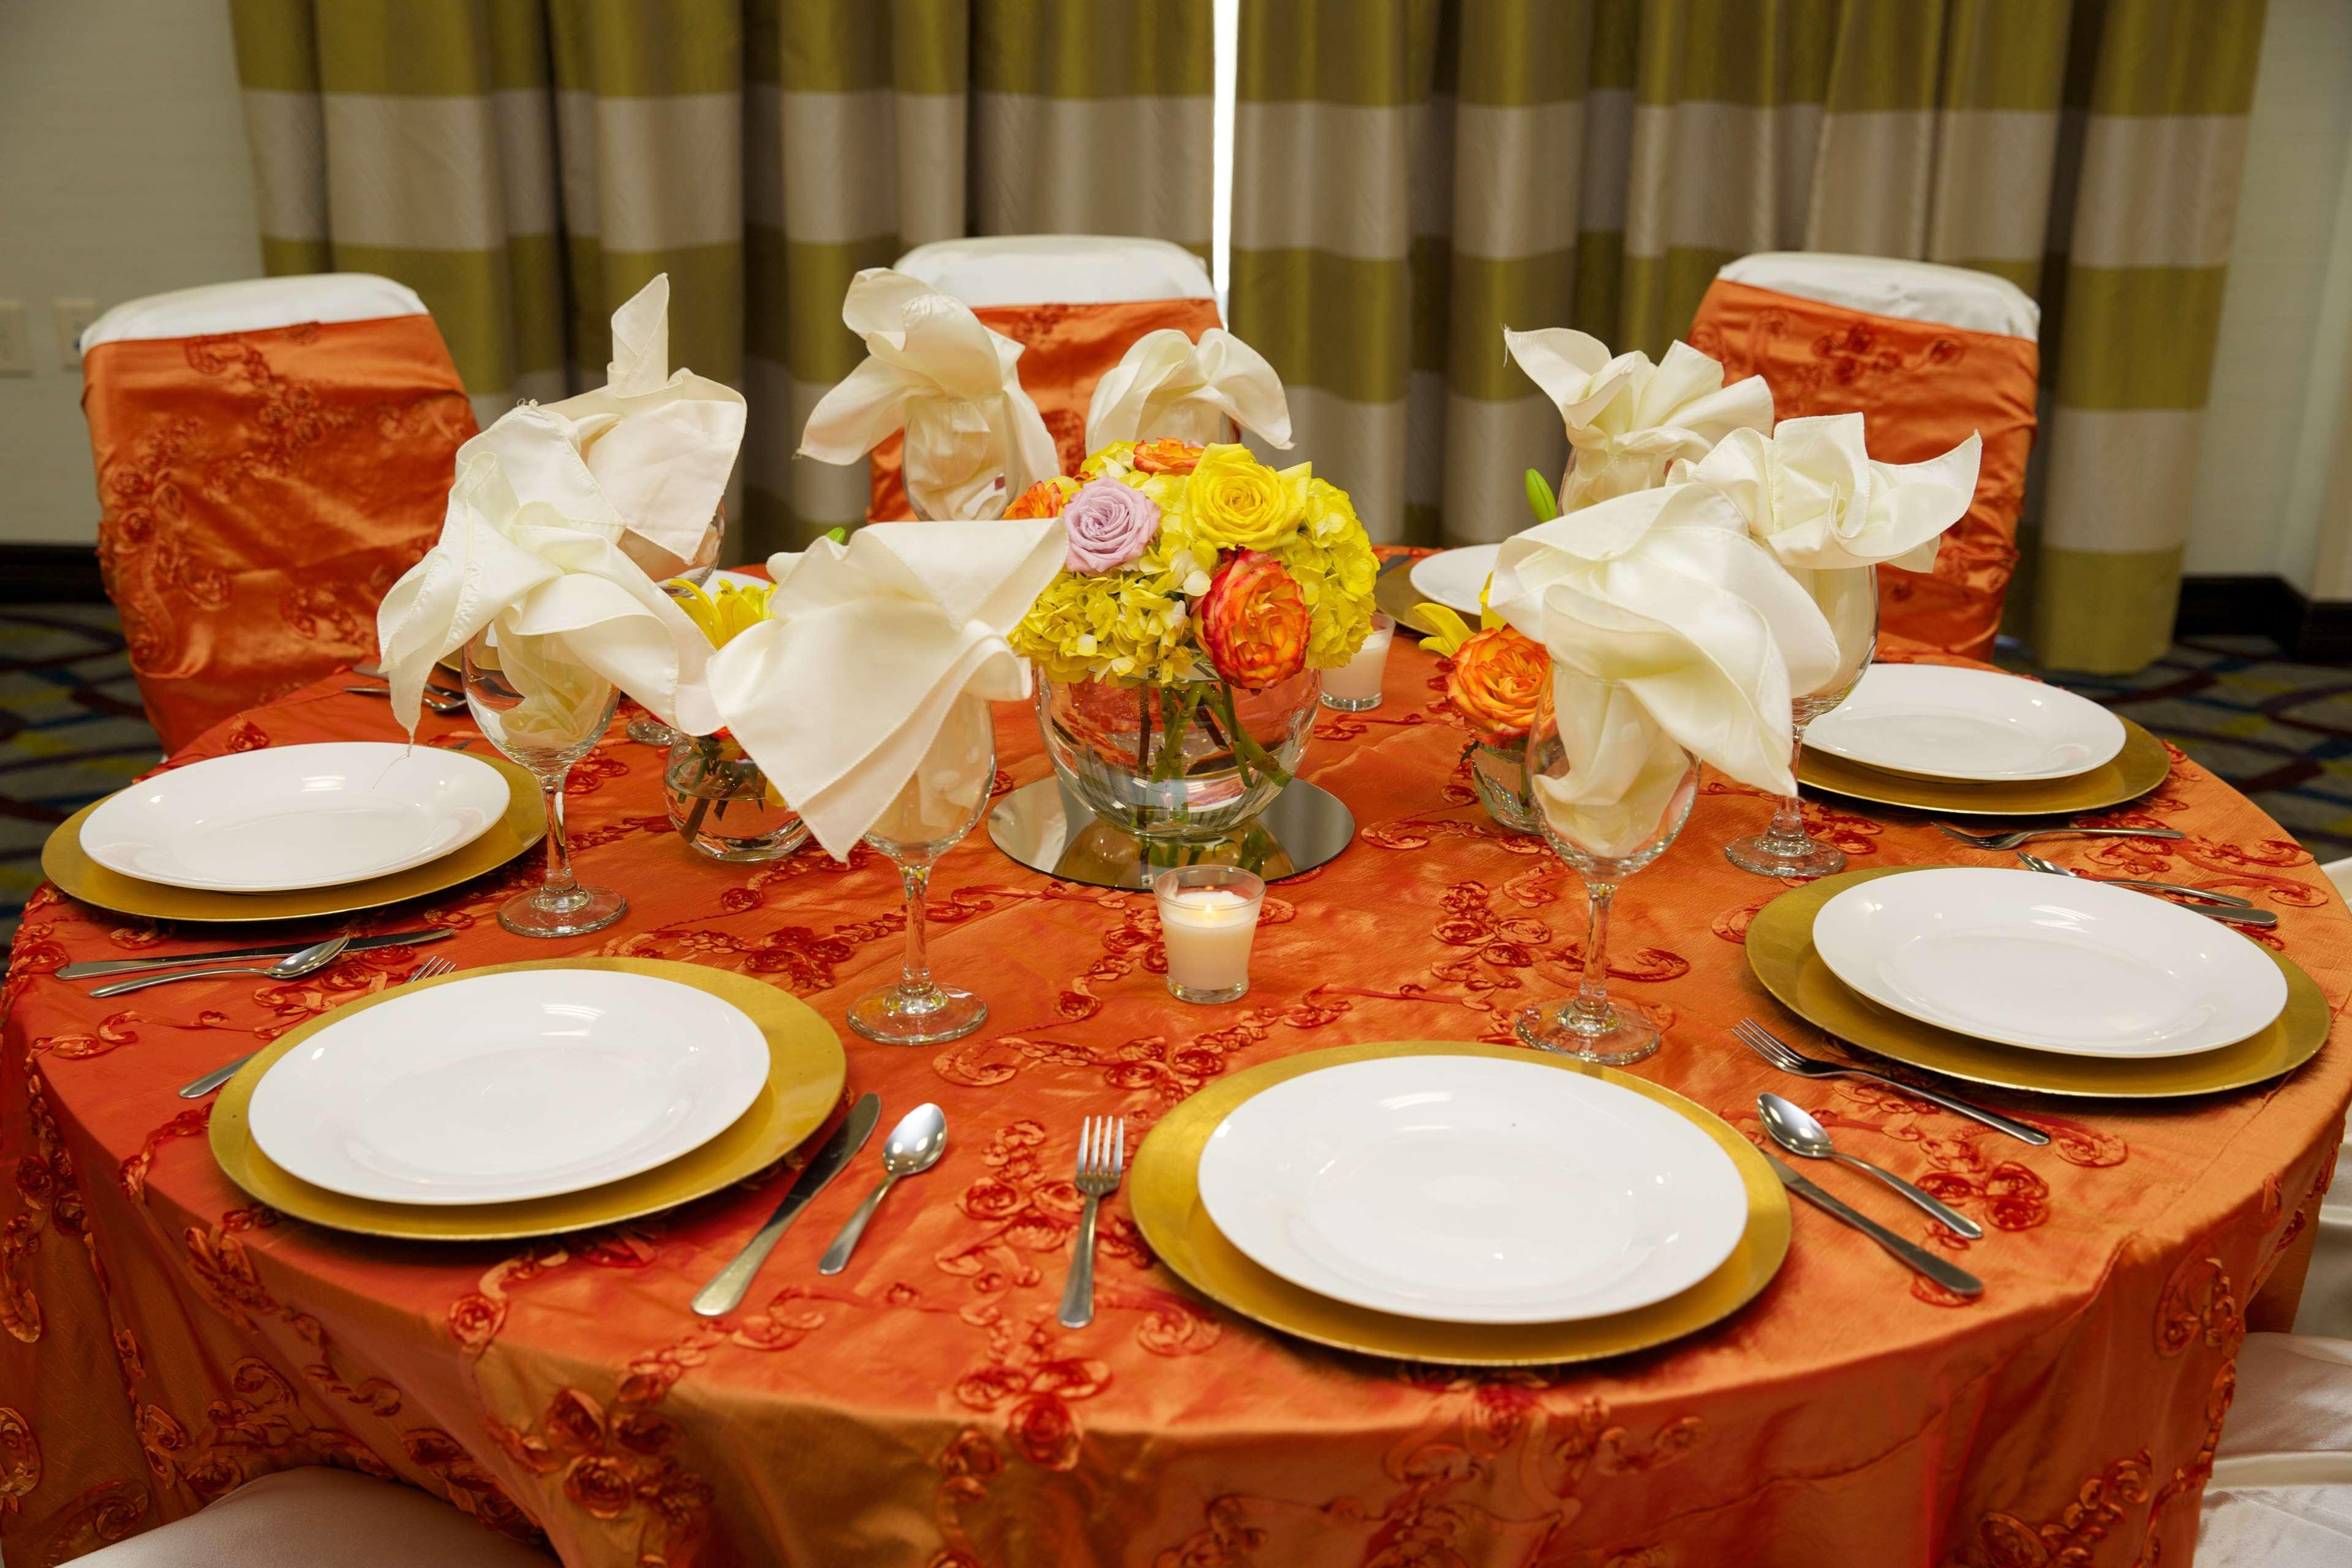 Hampton Inn & Suites Missouri City, TX image 40